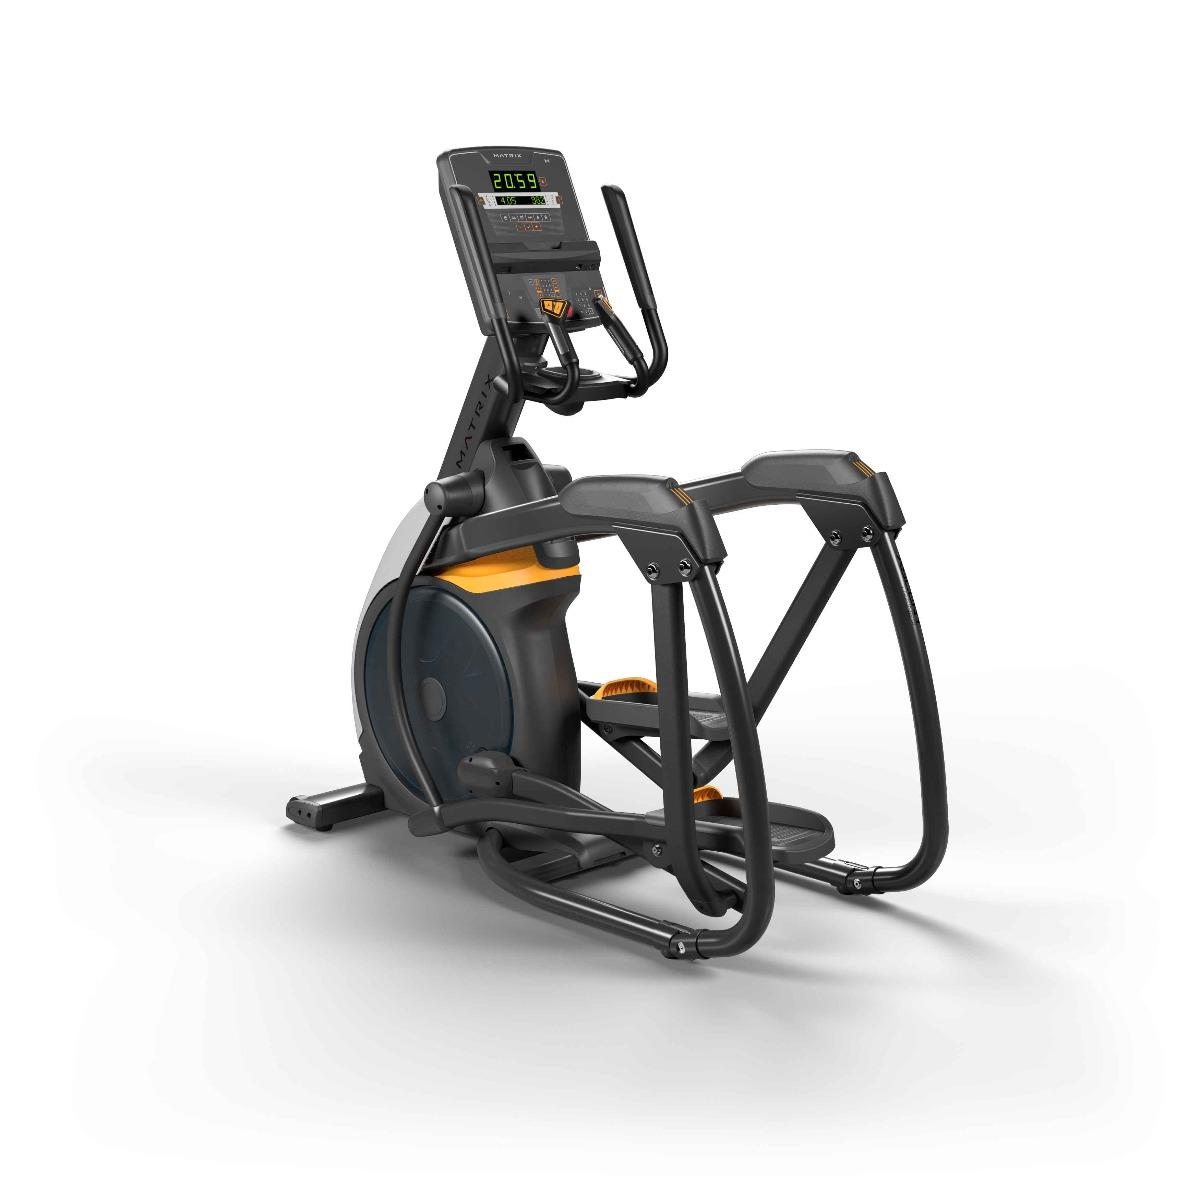 Commercial elliptical crosstrainers